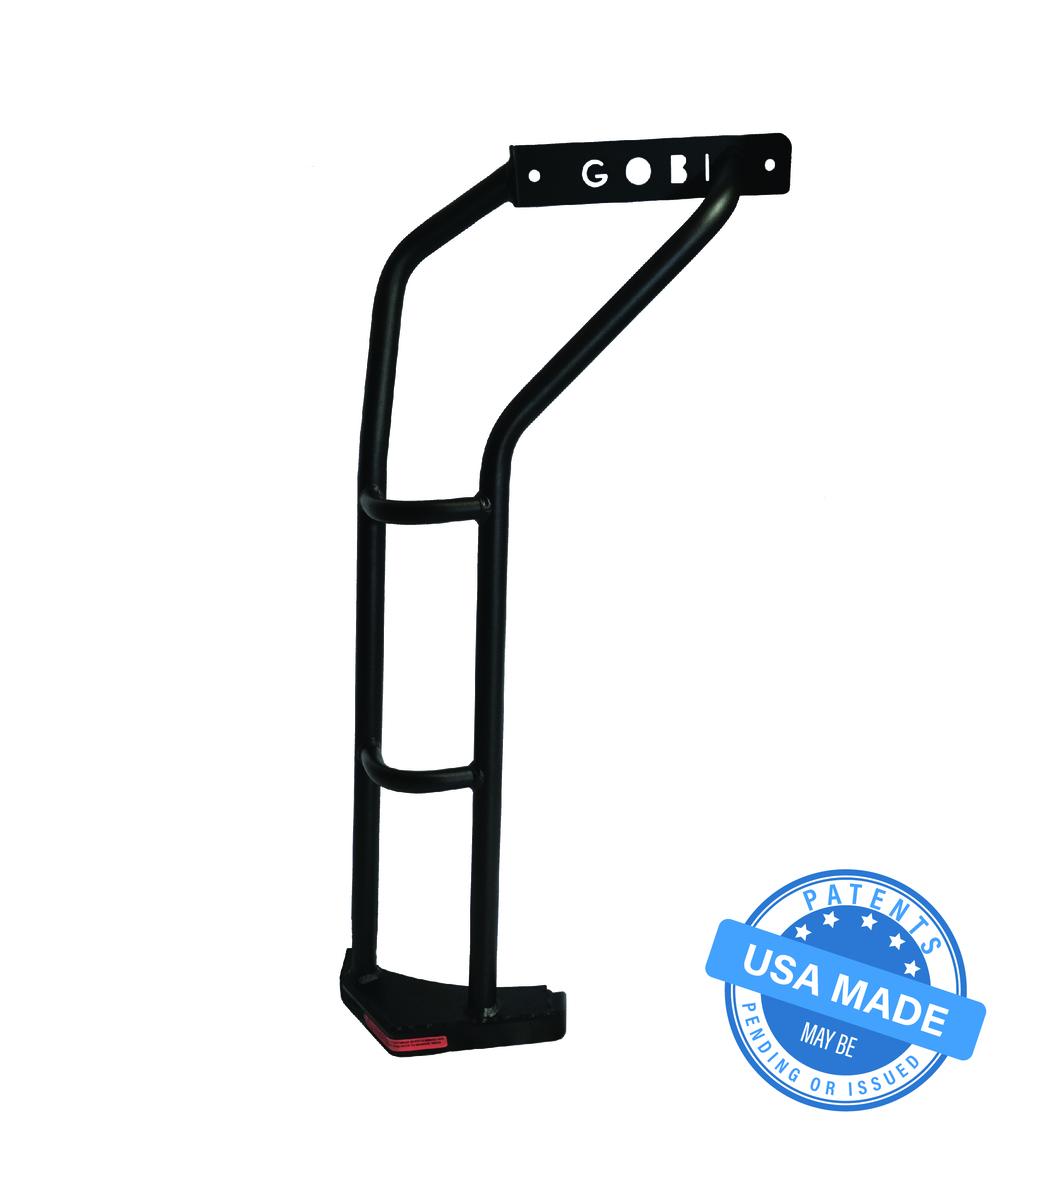 GOBI Jeep Wrangler JK Rear Ladder - Driver Side